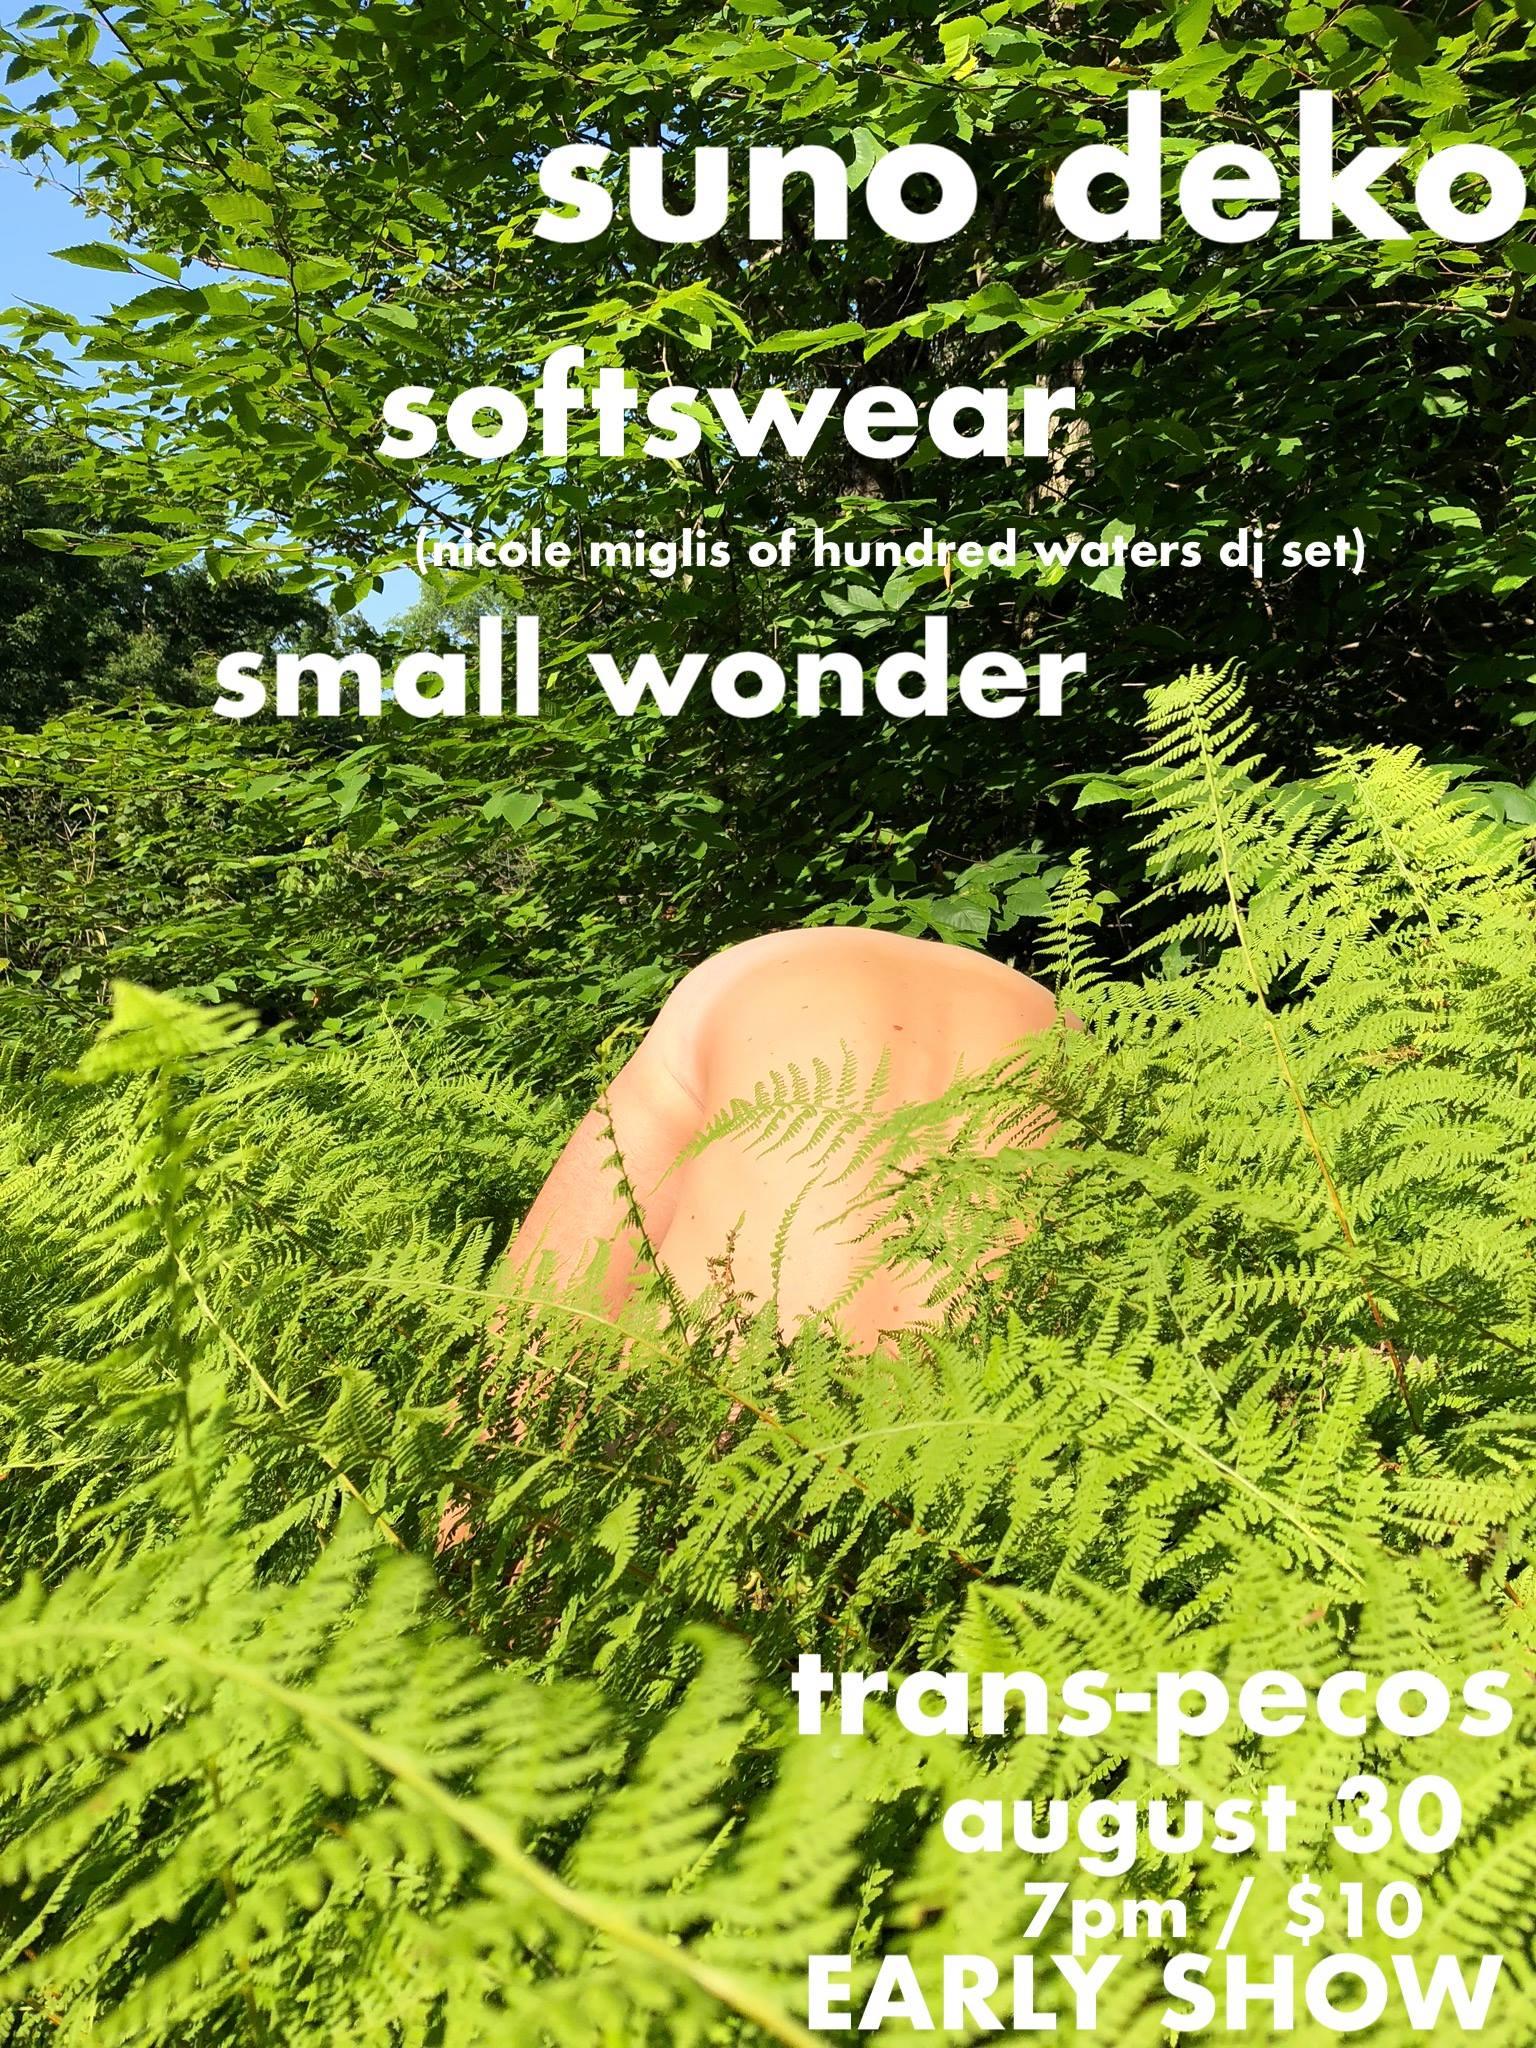 !!!!!!!!!EARLY SHOW!!!!!!!!!  suno deko ~a mood~  www.sunodeko.com   softswear ~nic miglis of 100waters dj moment~  https://omfgdogs.com/   small wonder ~diy royalty~  smallwonder.bandcamp.com